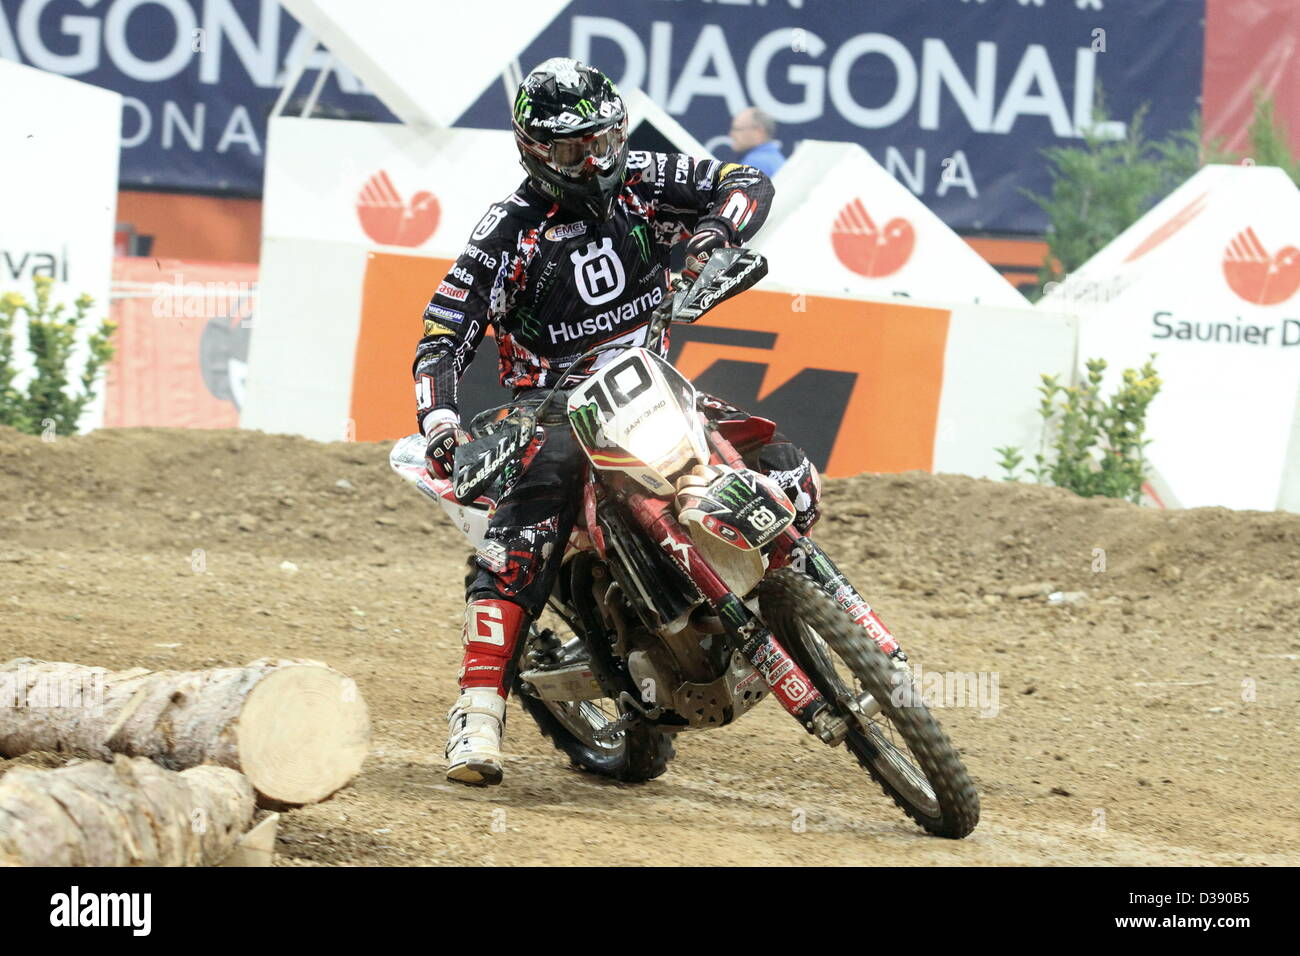 10.02.2013 Barcelona , Spain. FIM Superenduro World Championships. Picture shows Lorenzo Santolino ESP riding Husqvarna - Stock Image